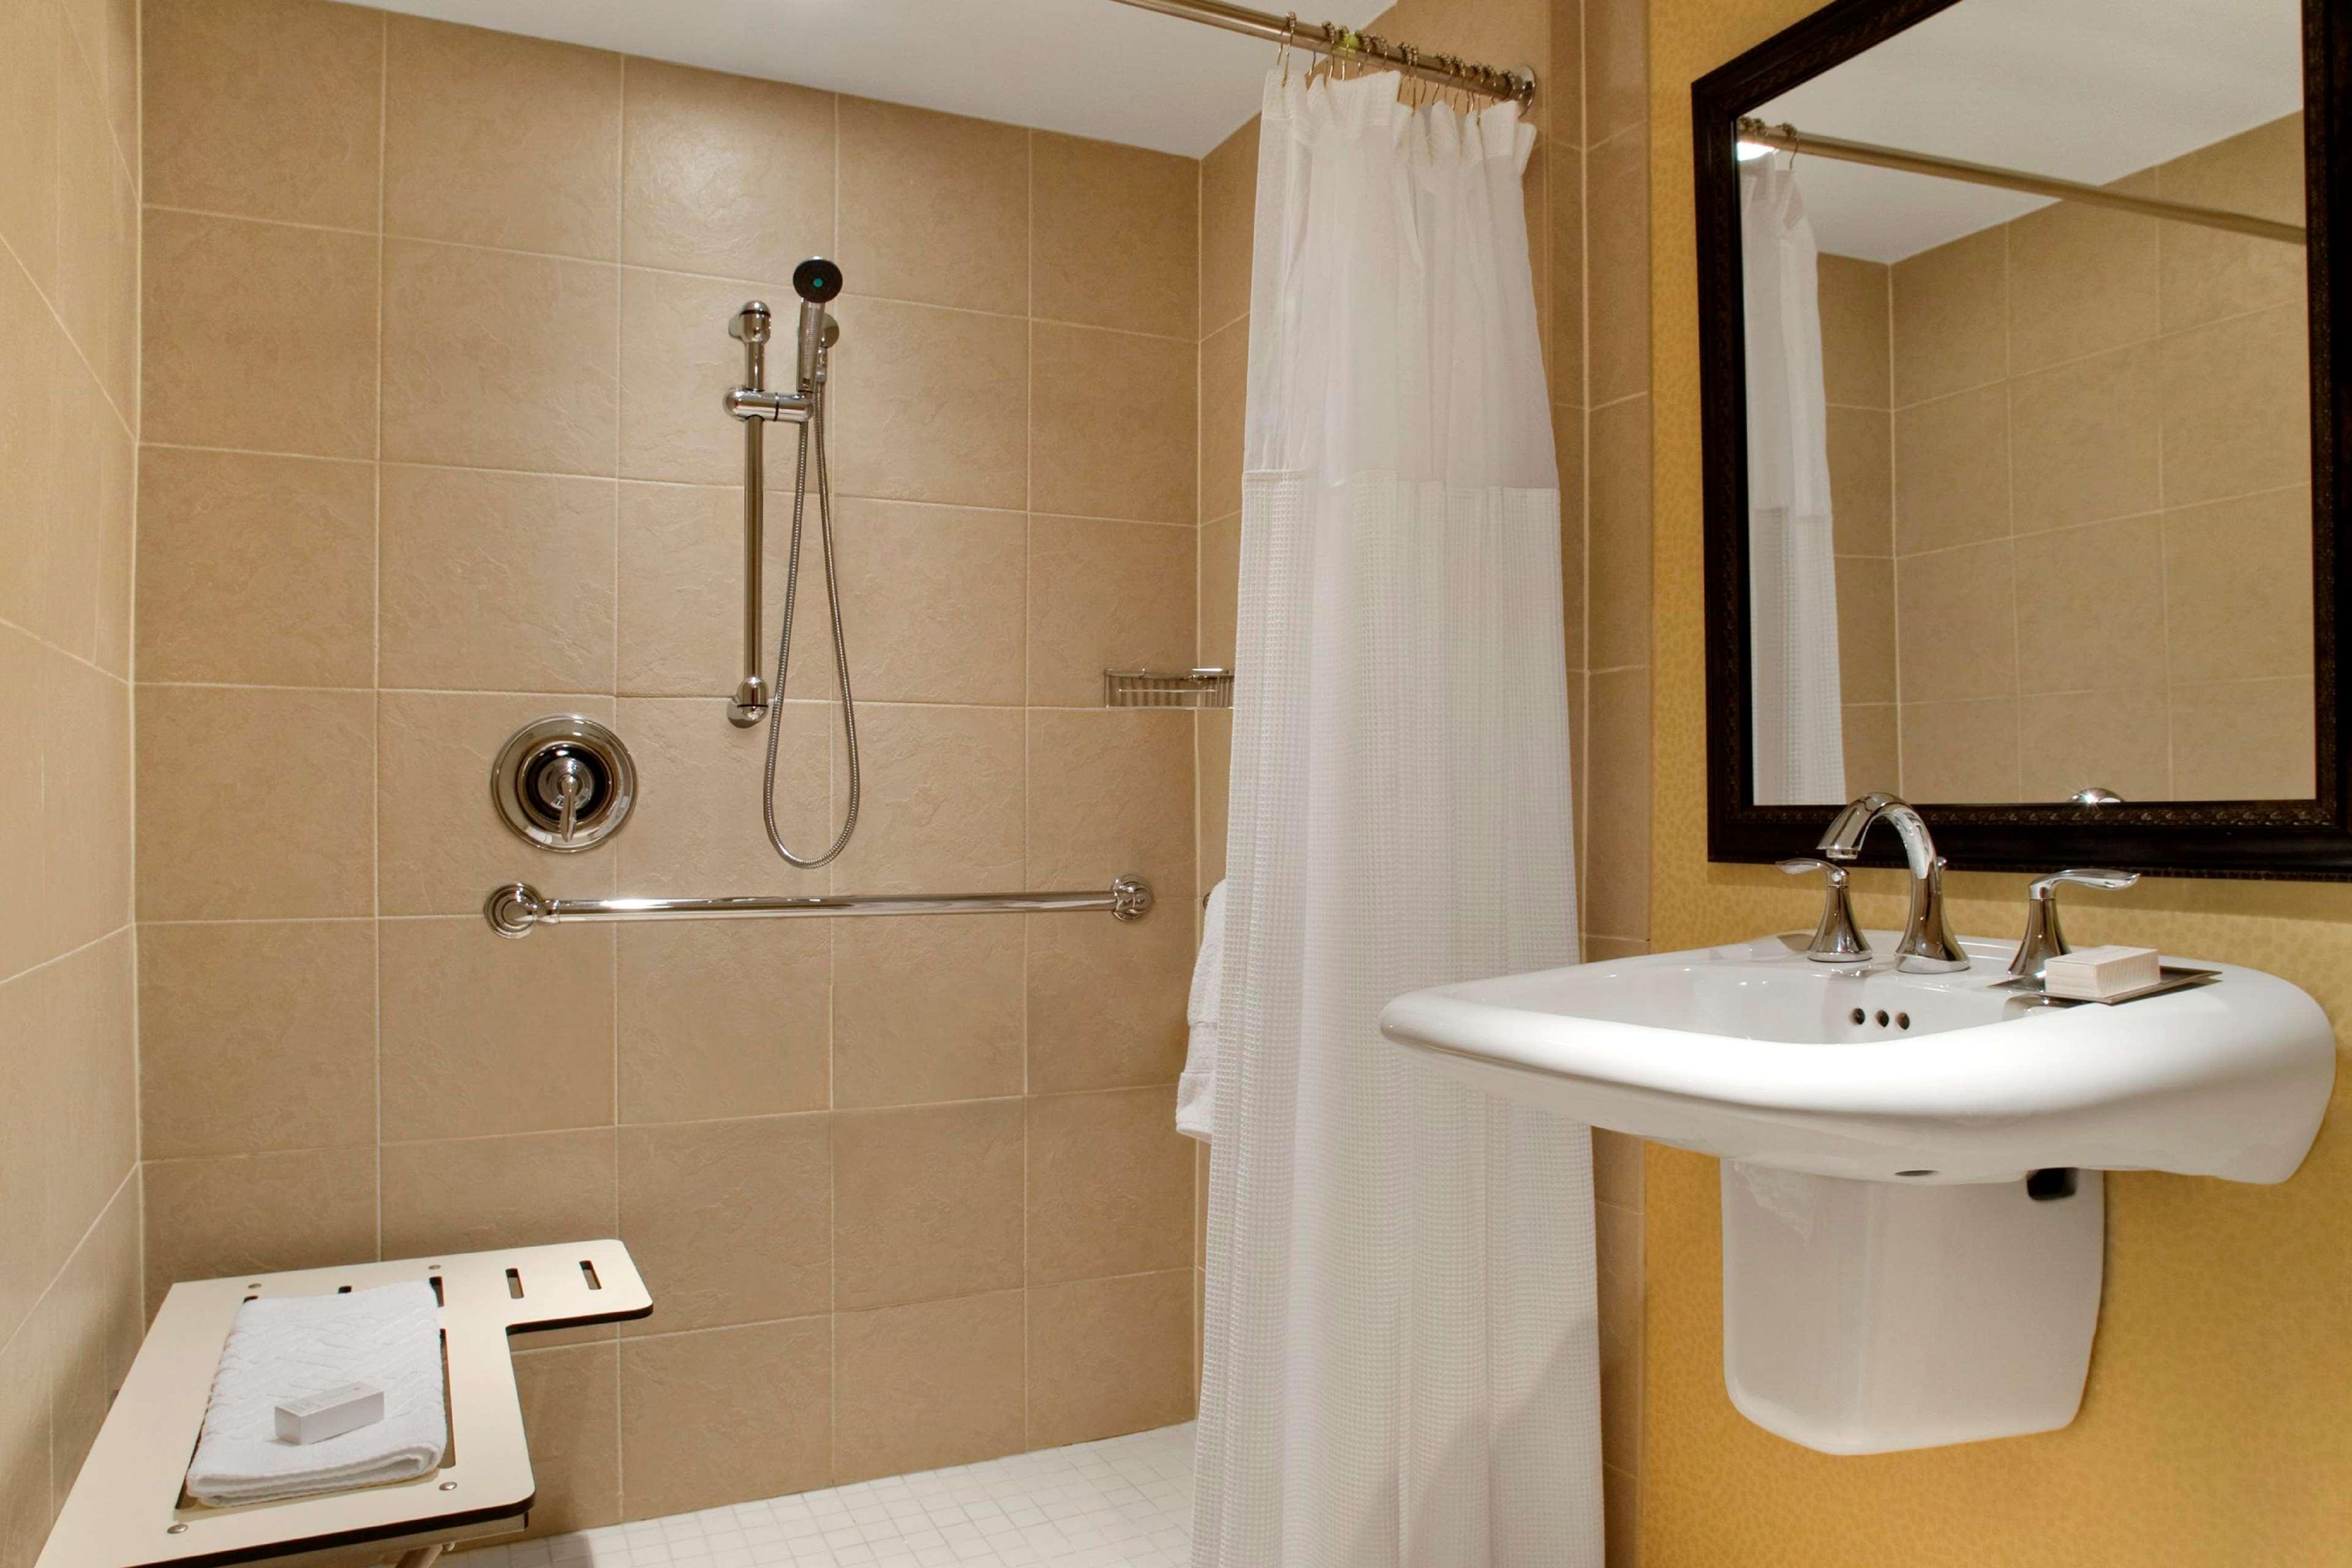 Hilton Washington DC/Rockville Hotel & Executive Meeting Ctr image 39